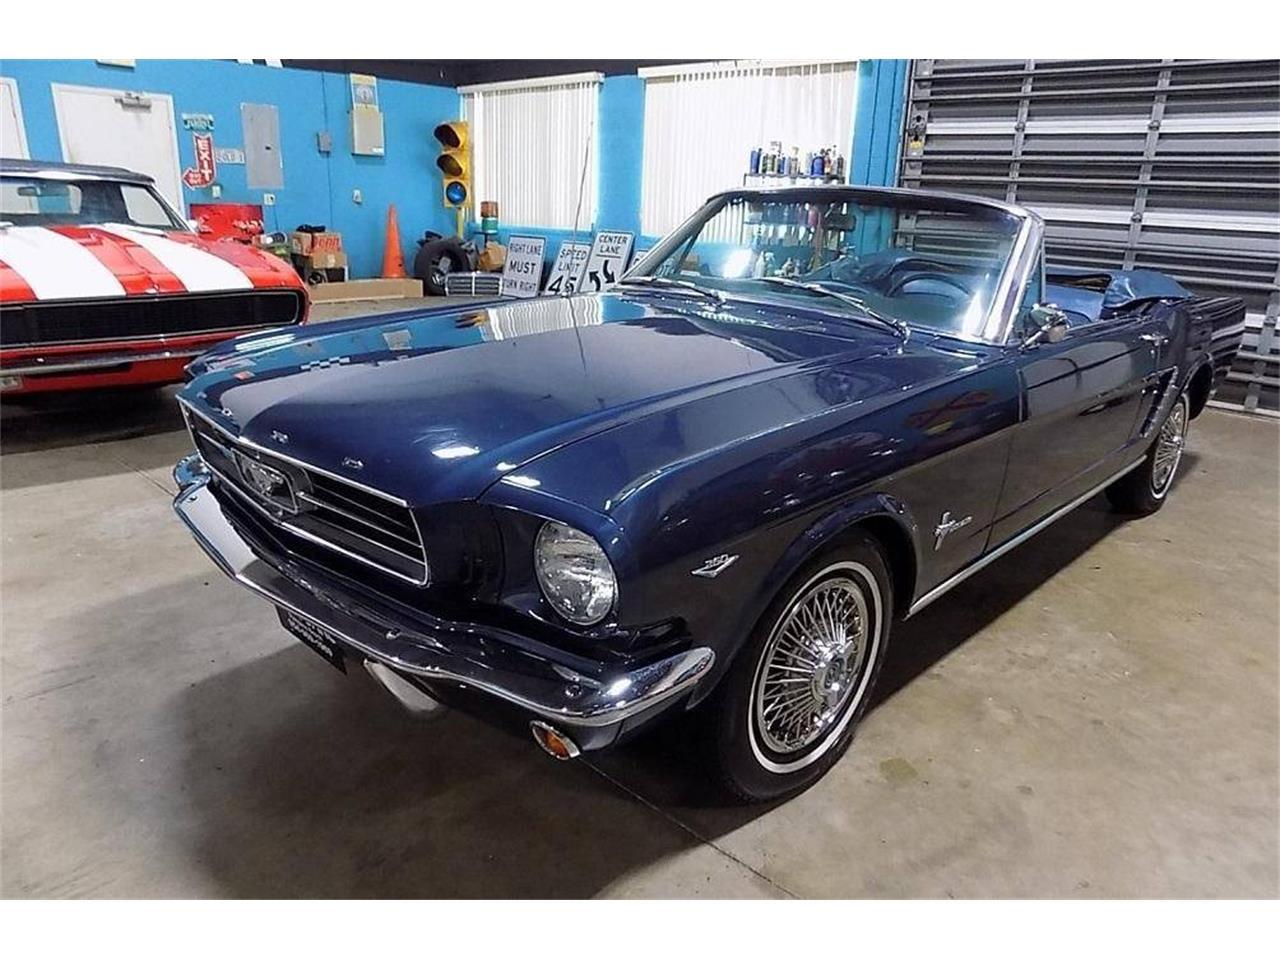 Ford Mustang V8 1965 prix tout compris 1965